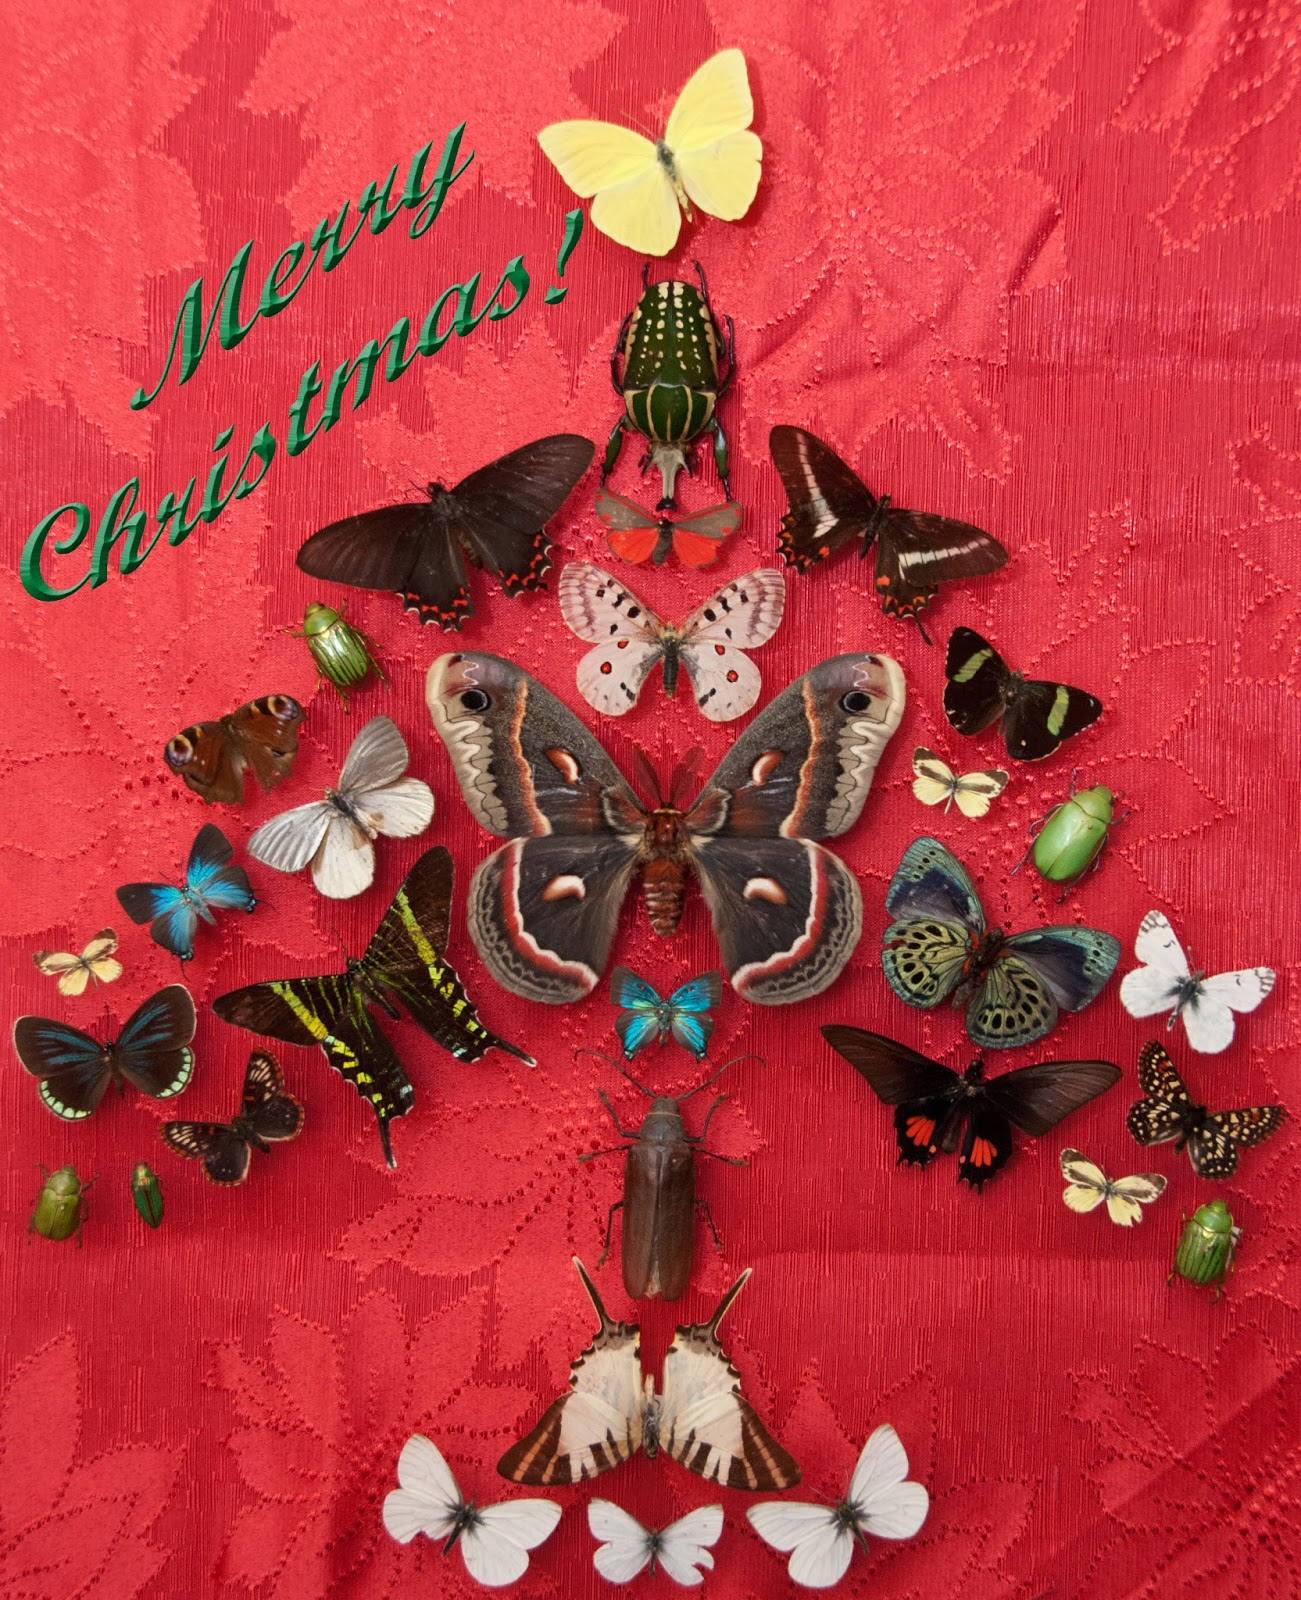 Northwest Butterflies Merry Christmas